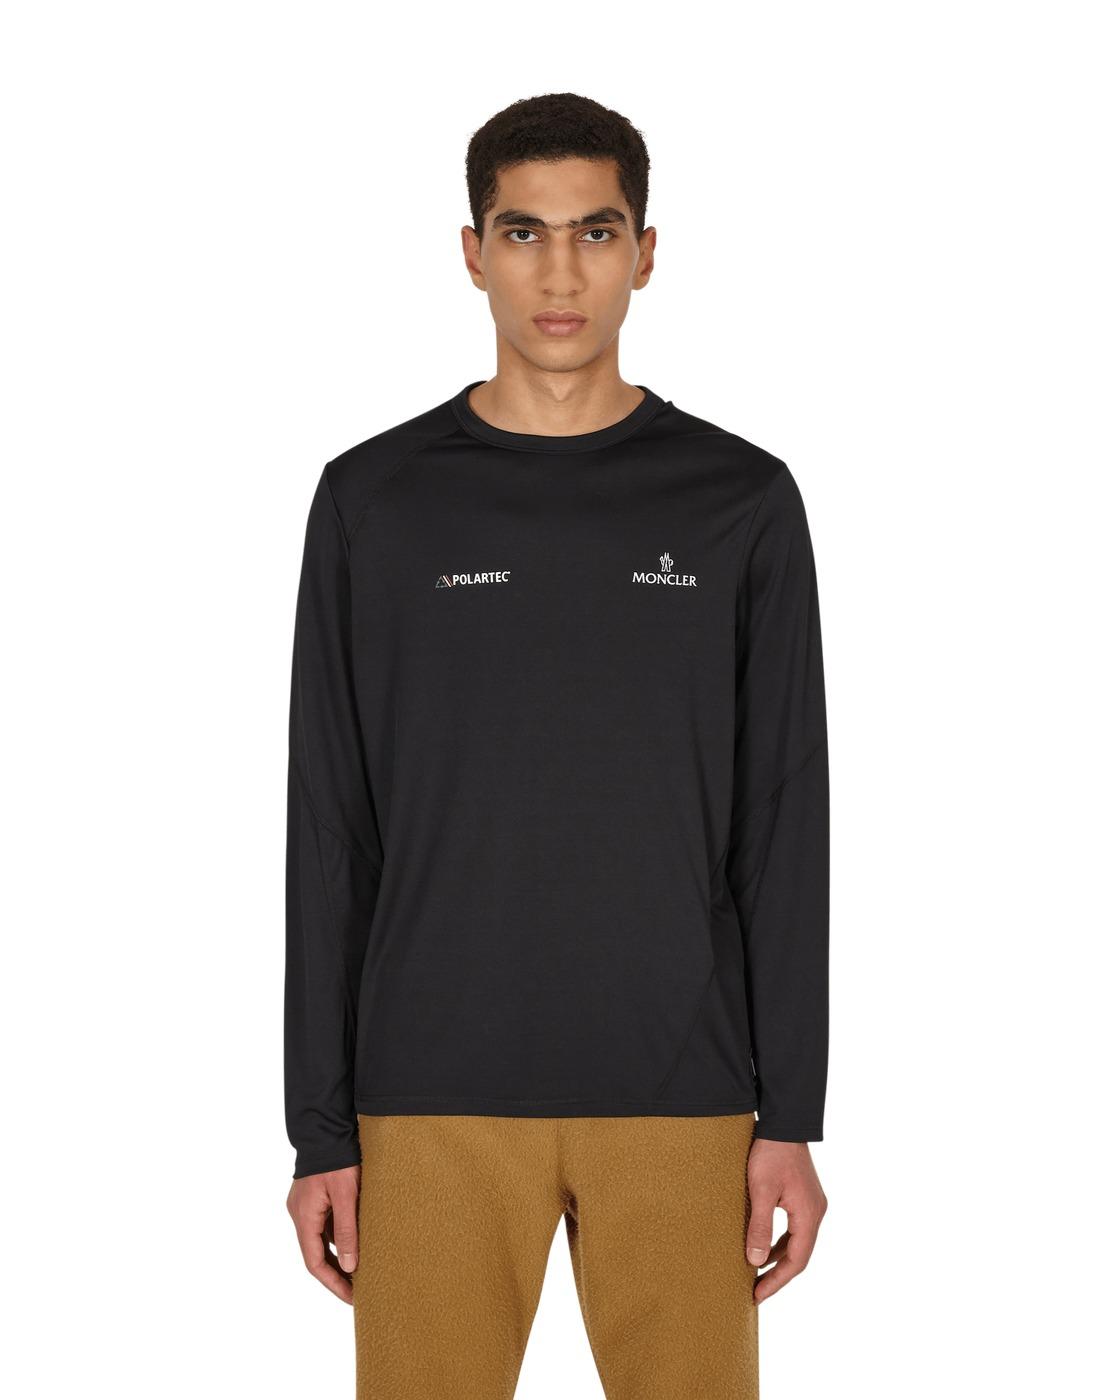 Photo: Moncler Polartec Longsleeve T Shirt Black